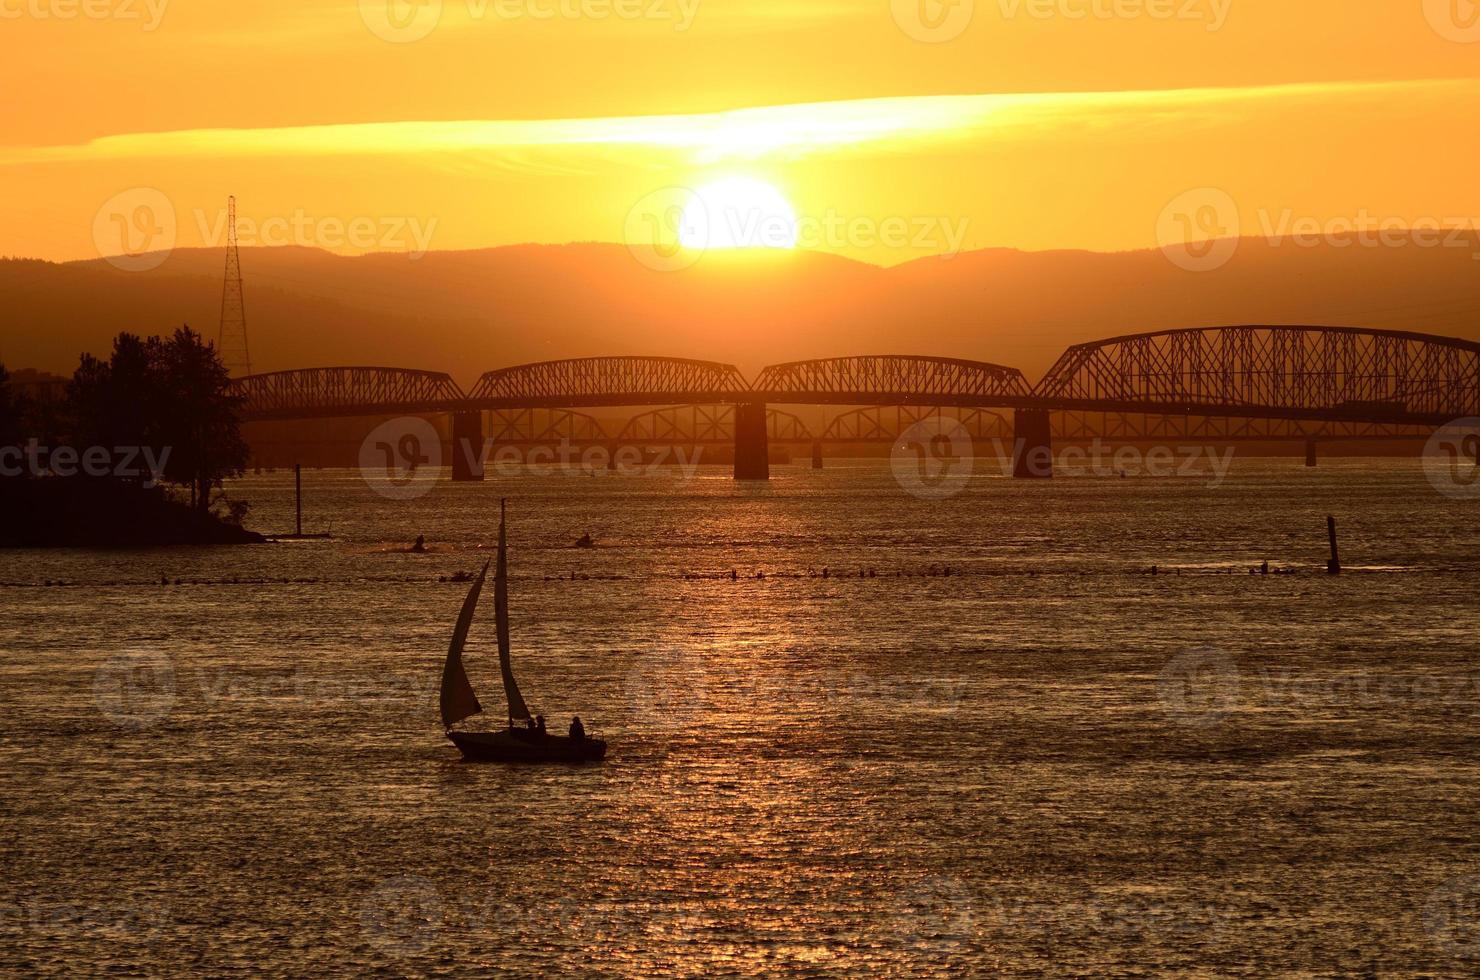 tramonto in barca a vela foto